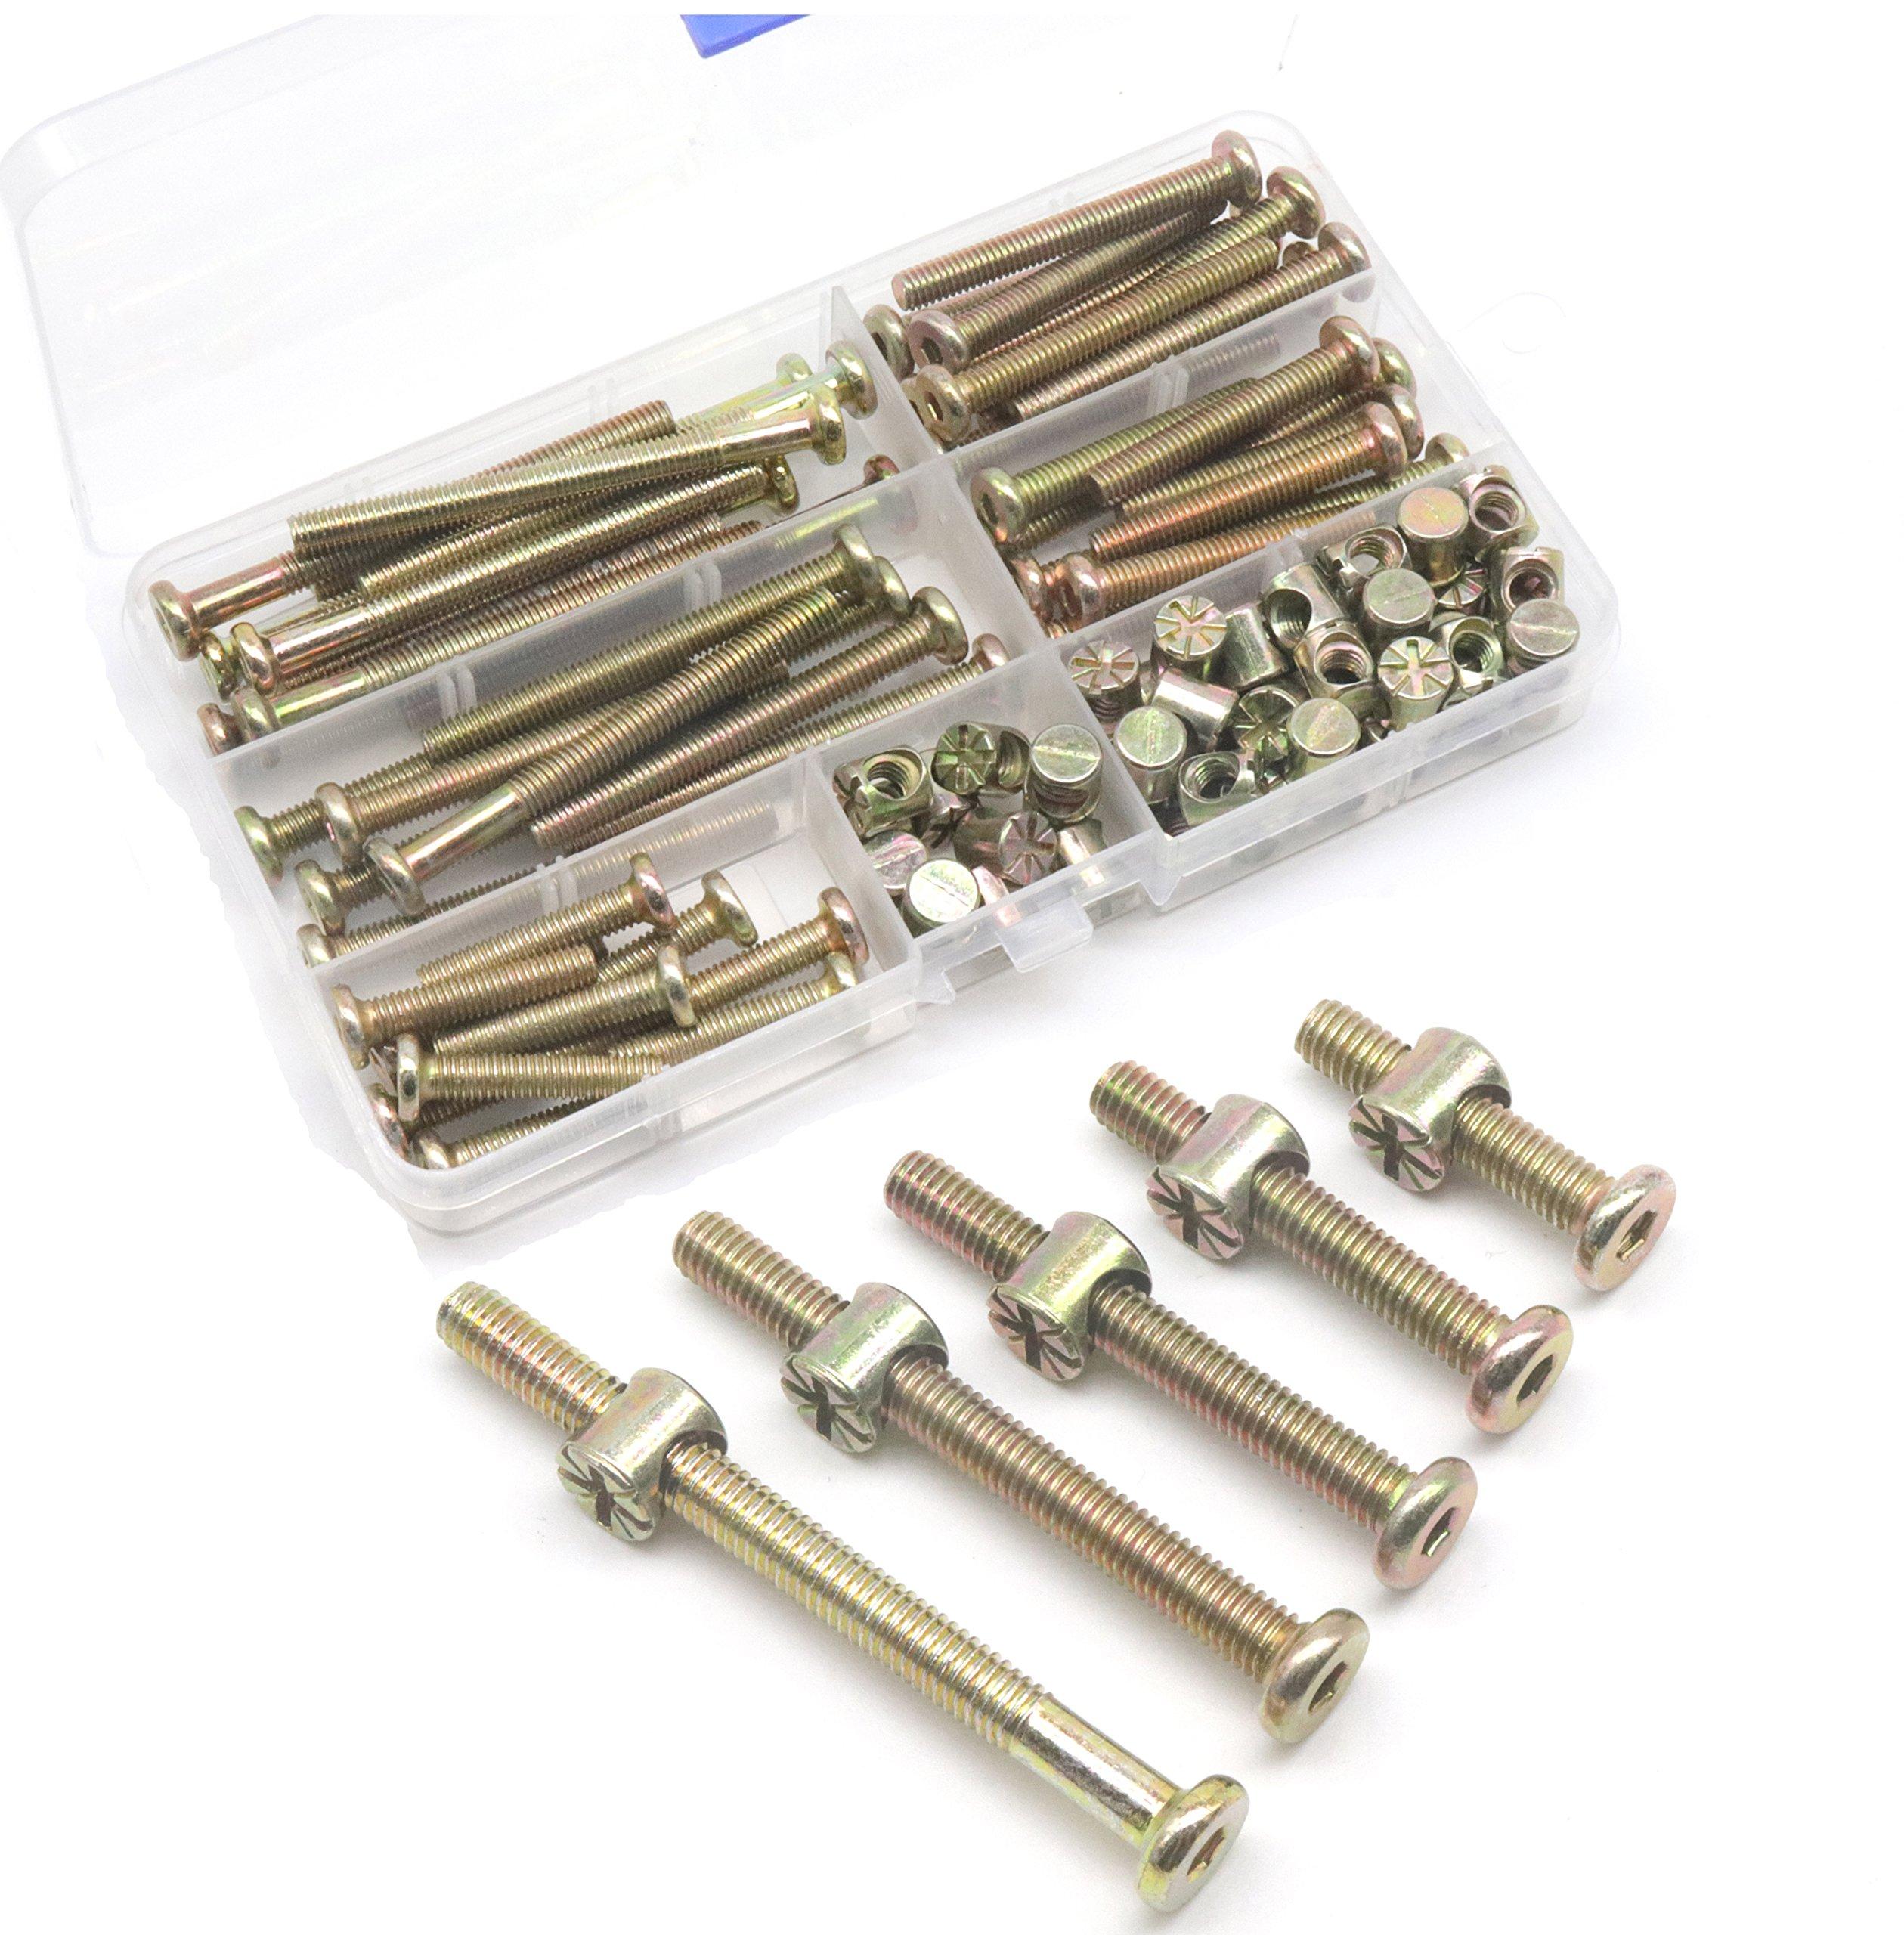 M6 Crib Screws Hardware Replacement Parts, cSeao 50-Set M6 Hex Drive Socket Cap Bunk Bed Bolts Barrel Nuts Assortment Kit, M6 x 30mm/40mm/50mm/60mm/70mm, Zinc Plated